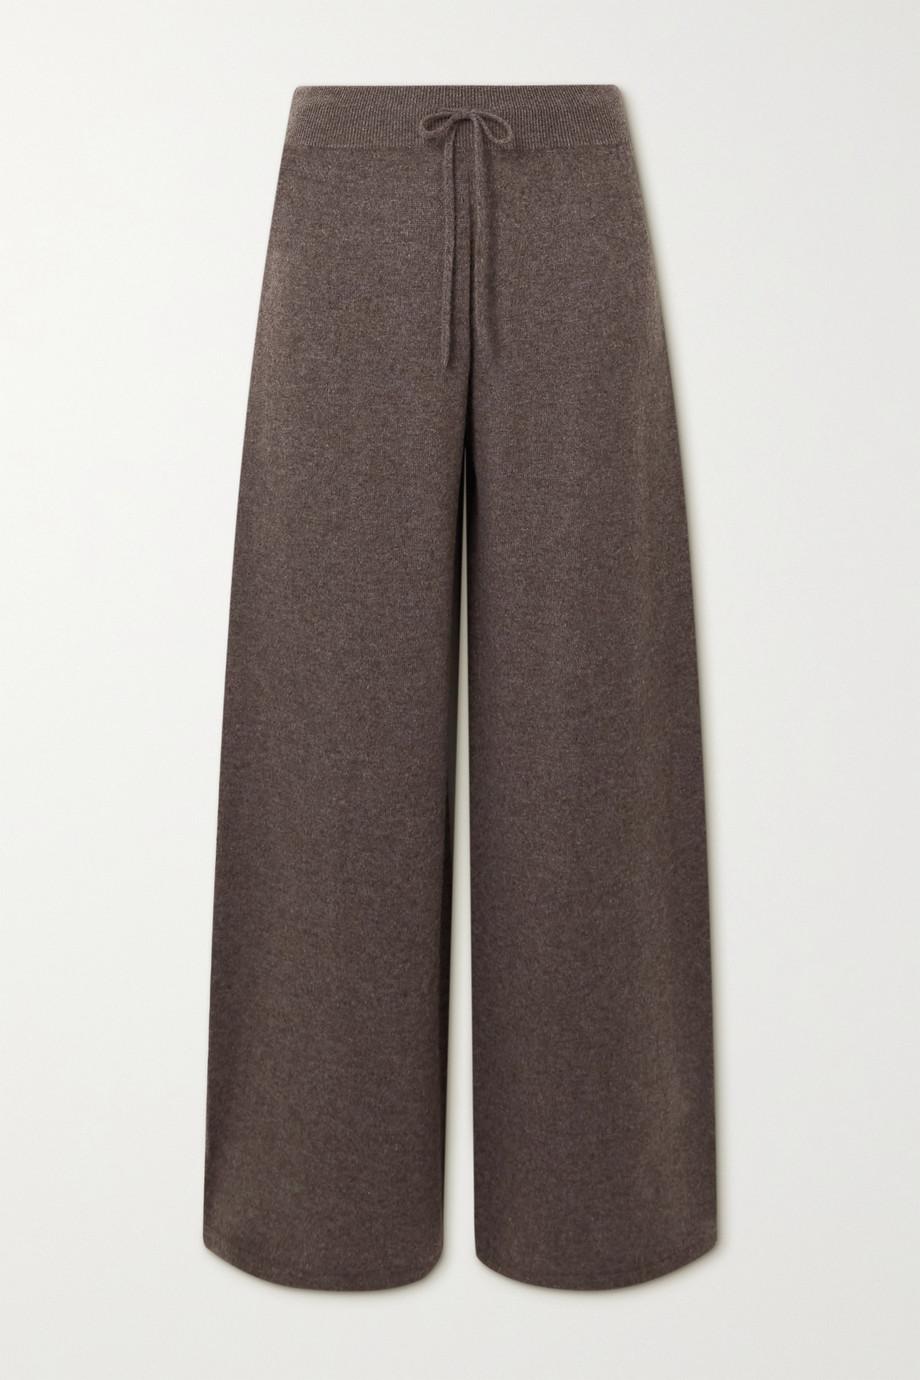 Lisa Yang Sofi cashmere wide-leg pants